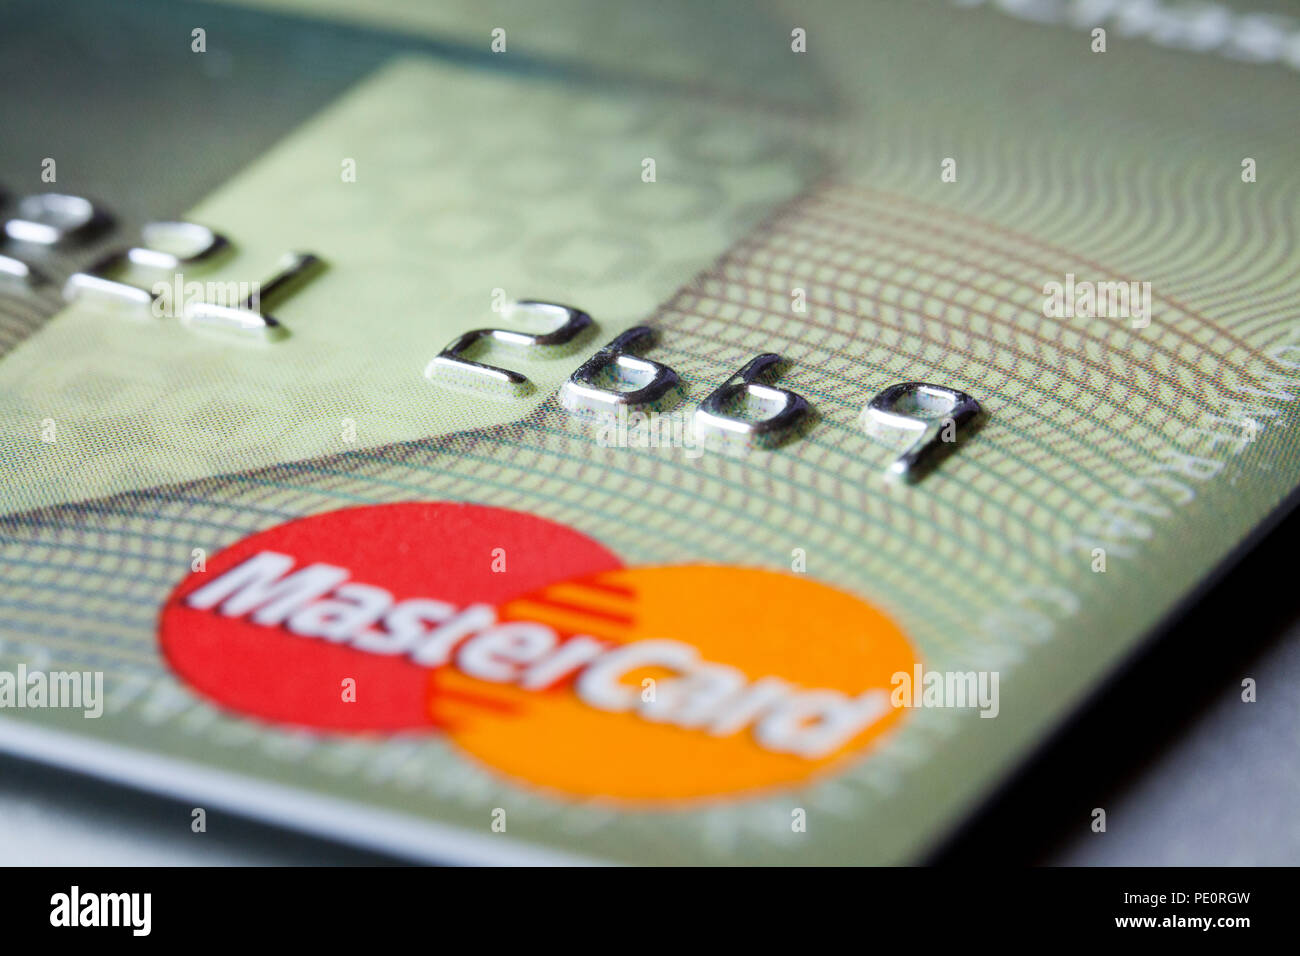 Master Card (MasterCard) credit card logo and last four digits closeup - USA - Stock Image